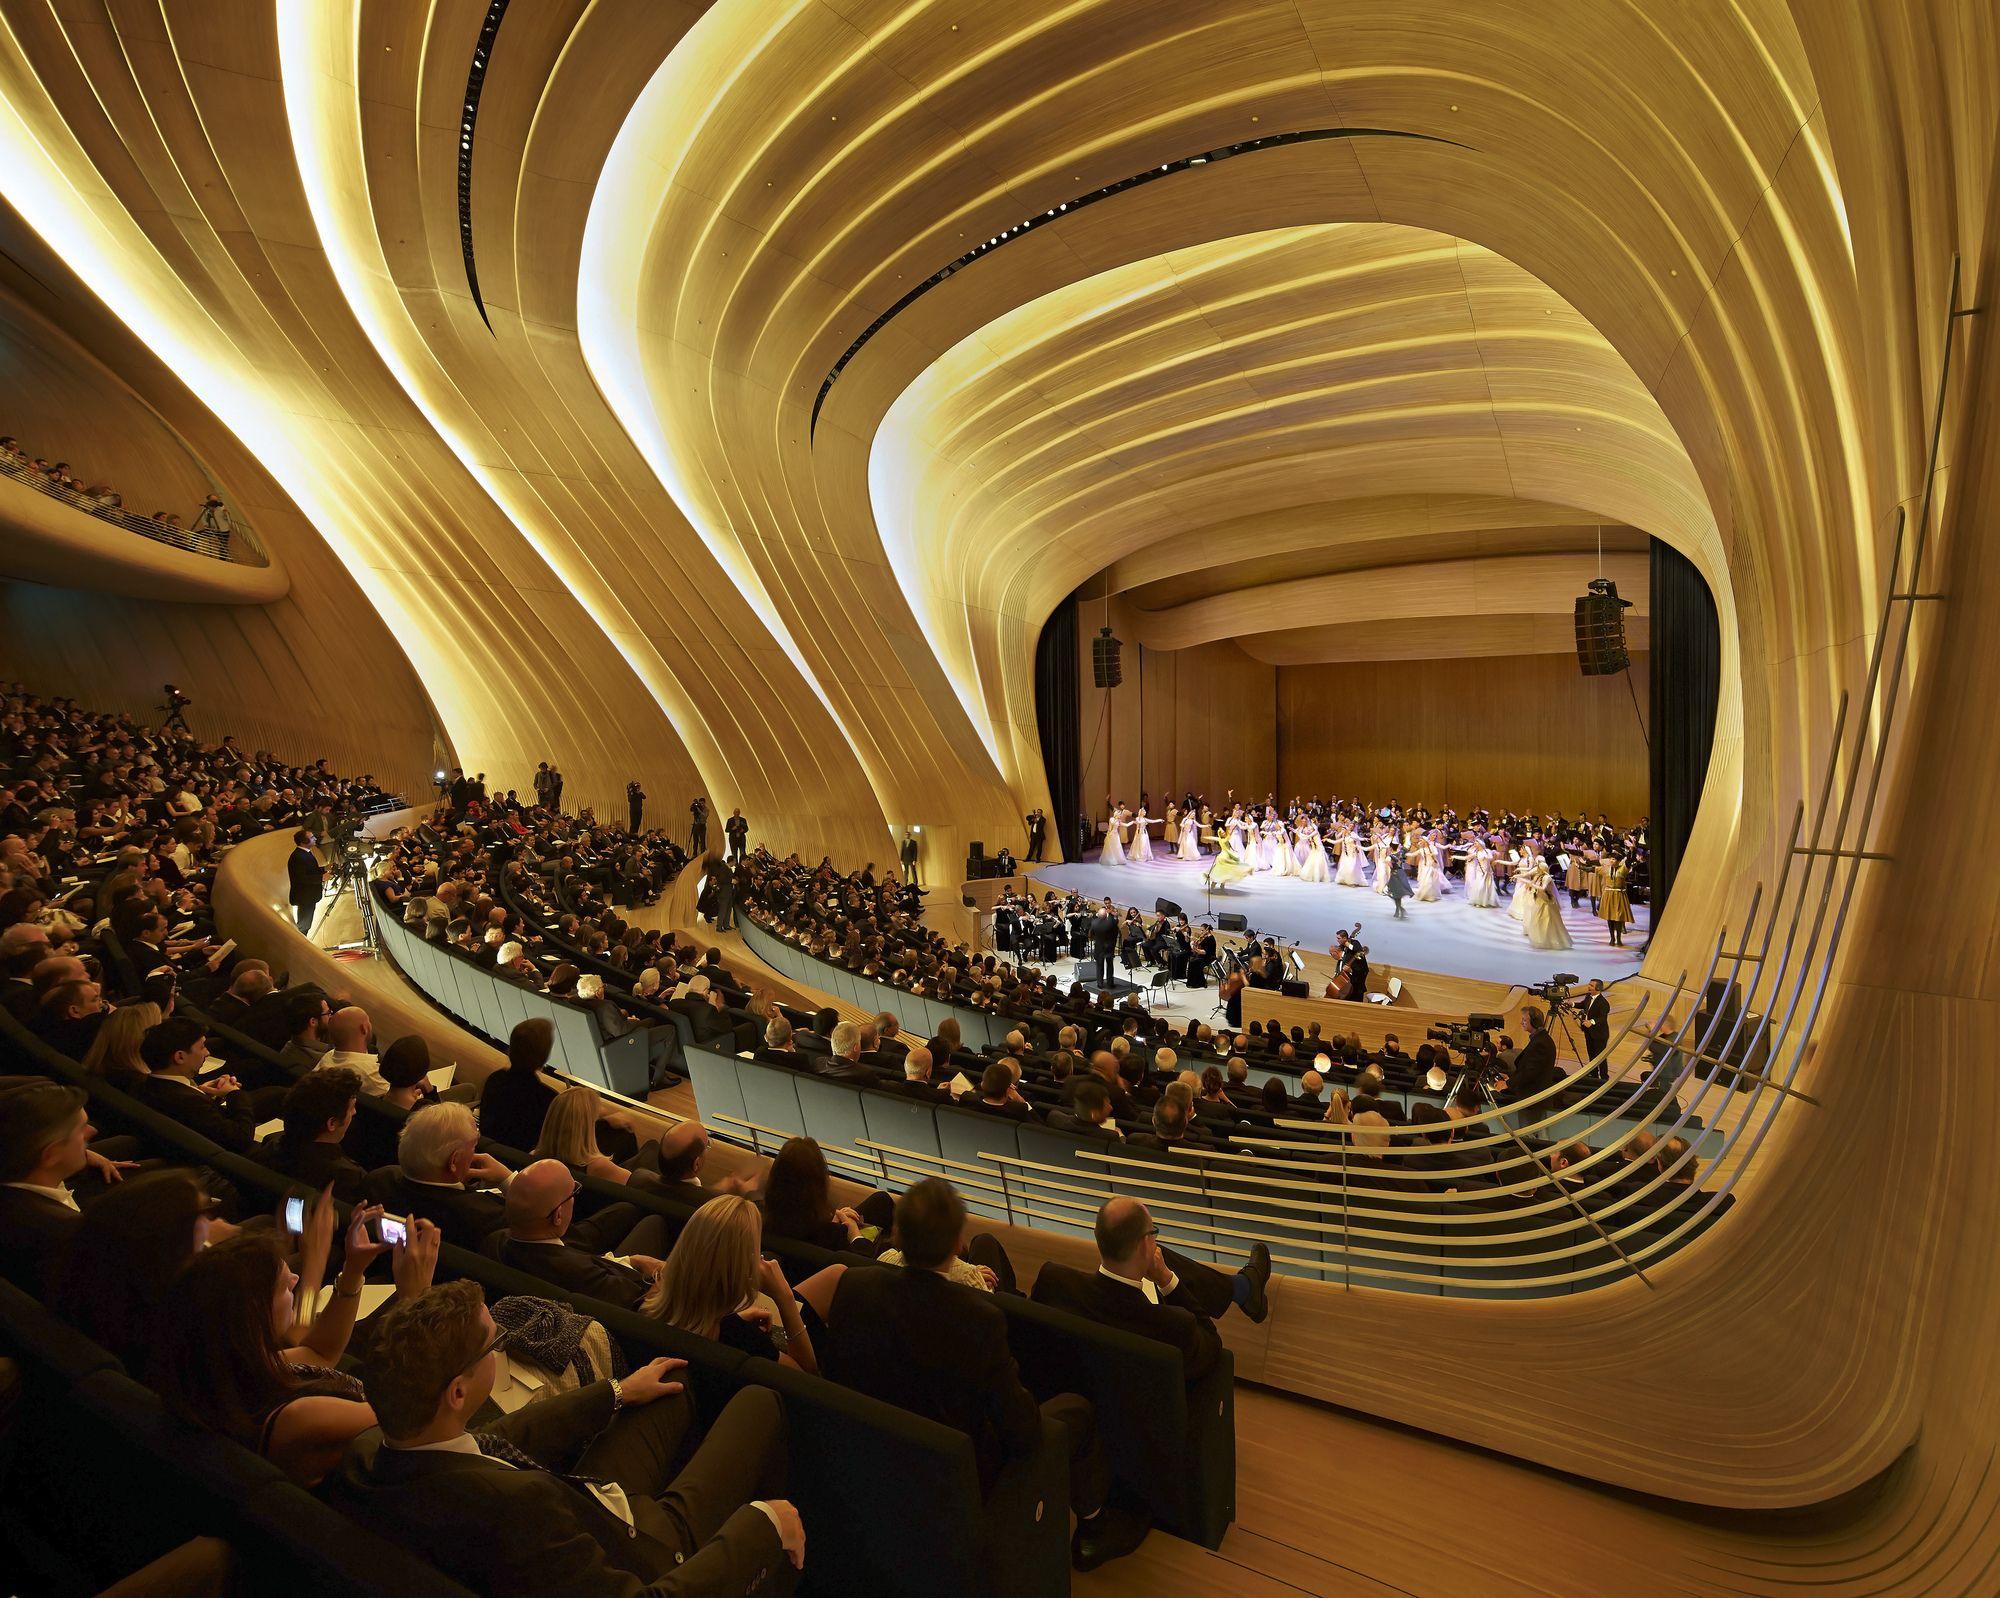 Galería - Centro Heydar Aliyev / Zaha Hadid Architects - 34